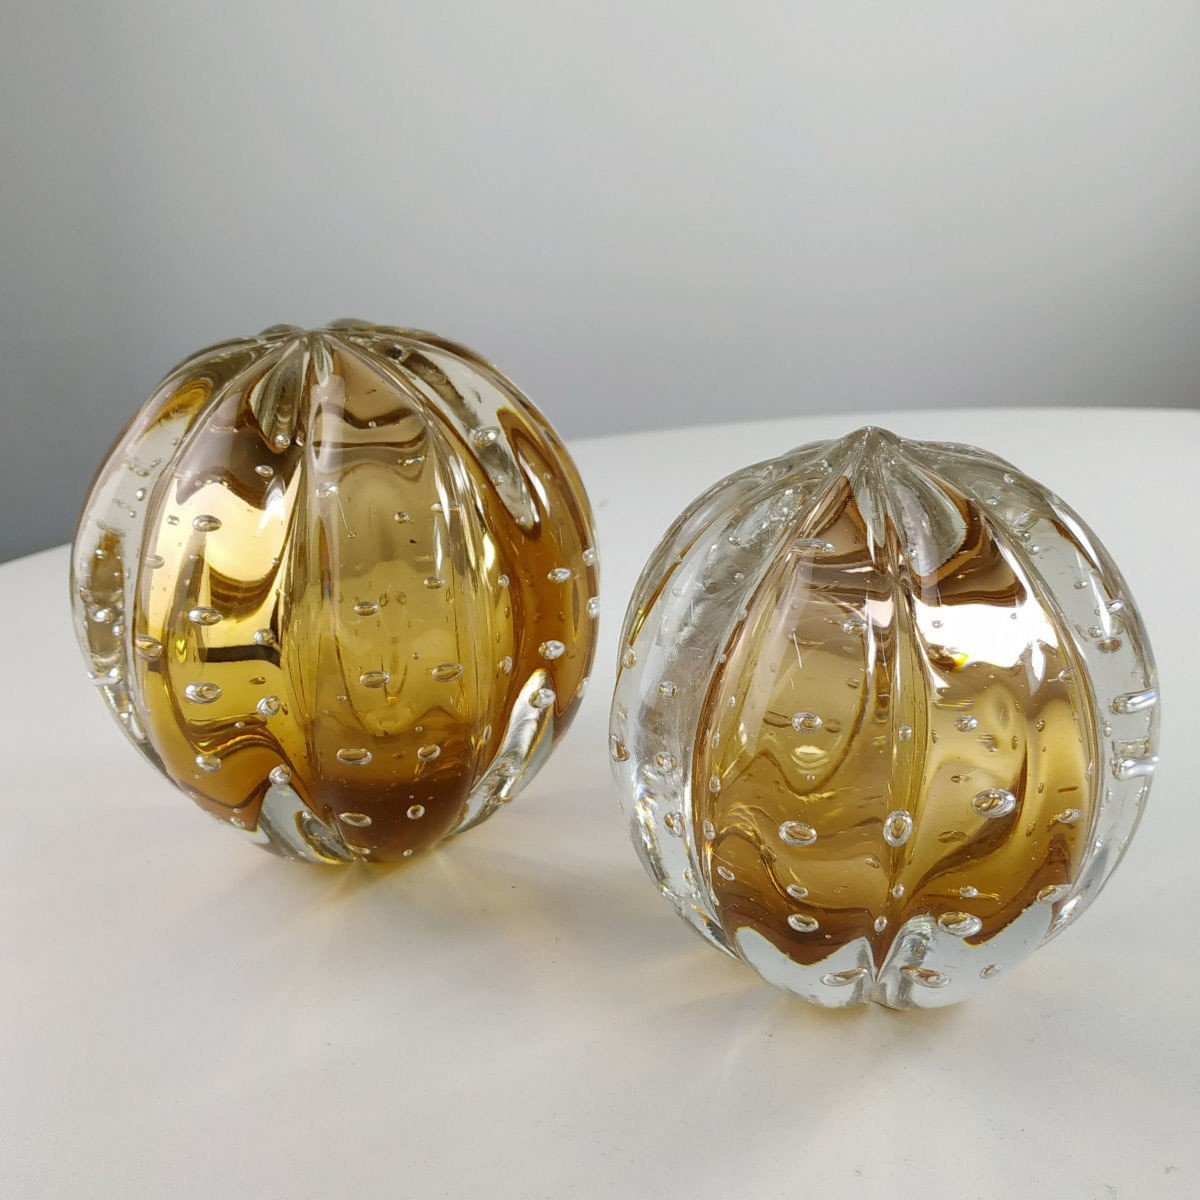 Peso de Cristal Murano D'labone - Cristal Garnet Senna 8cm